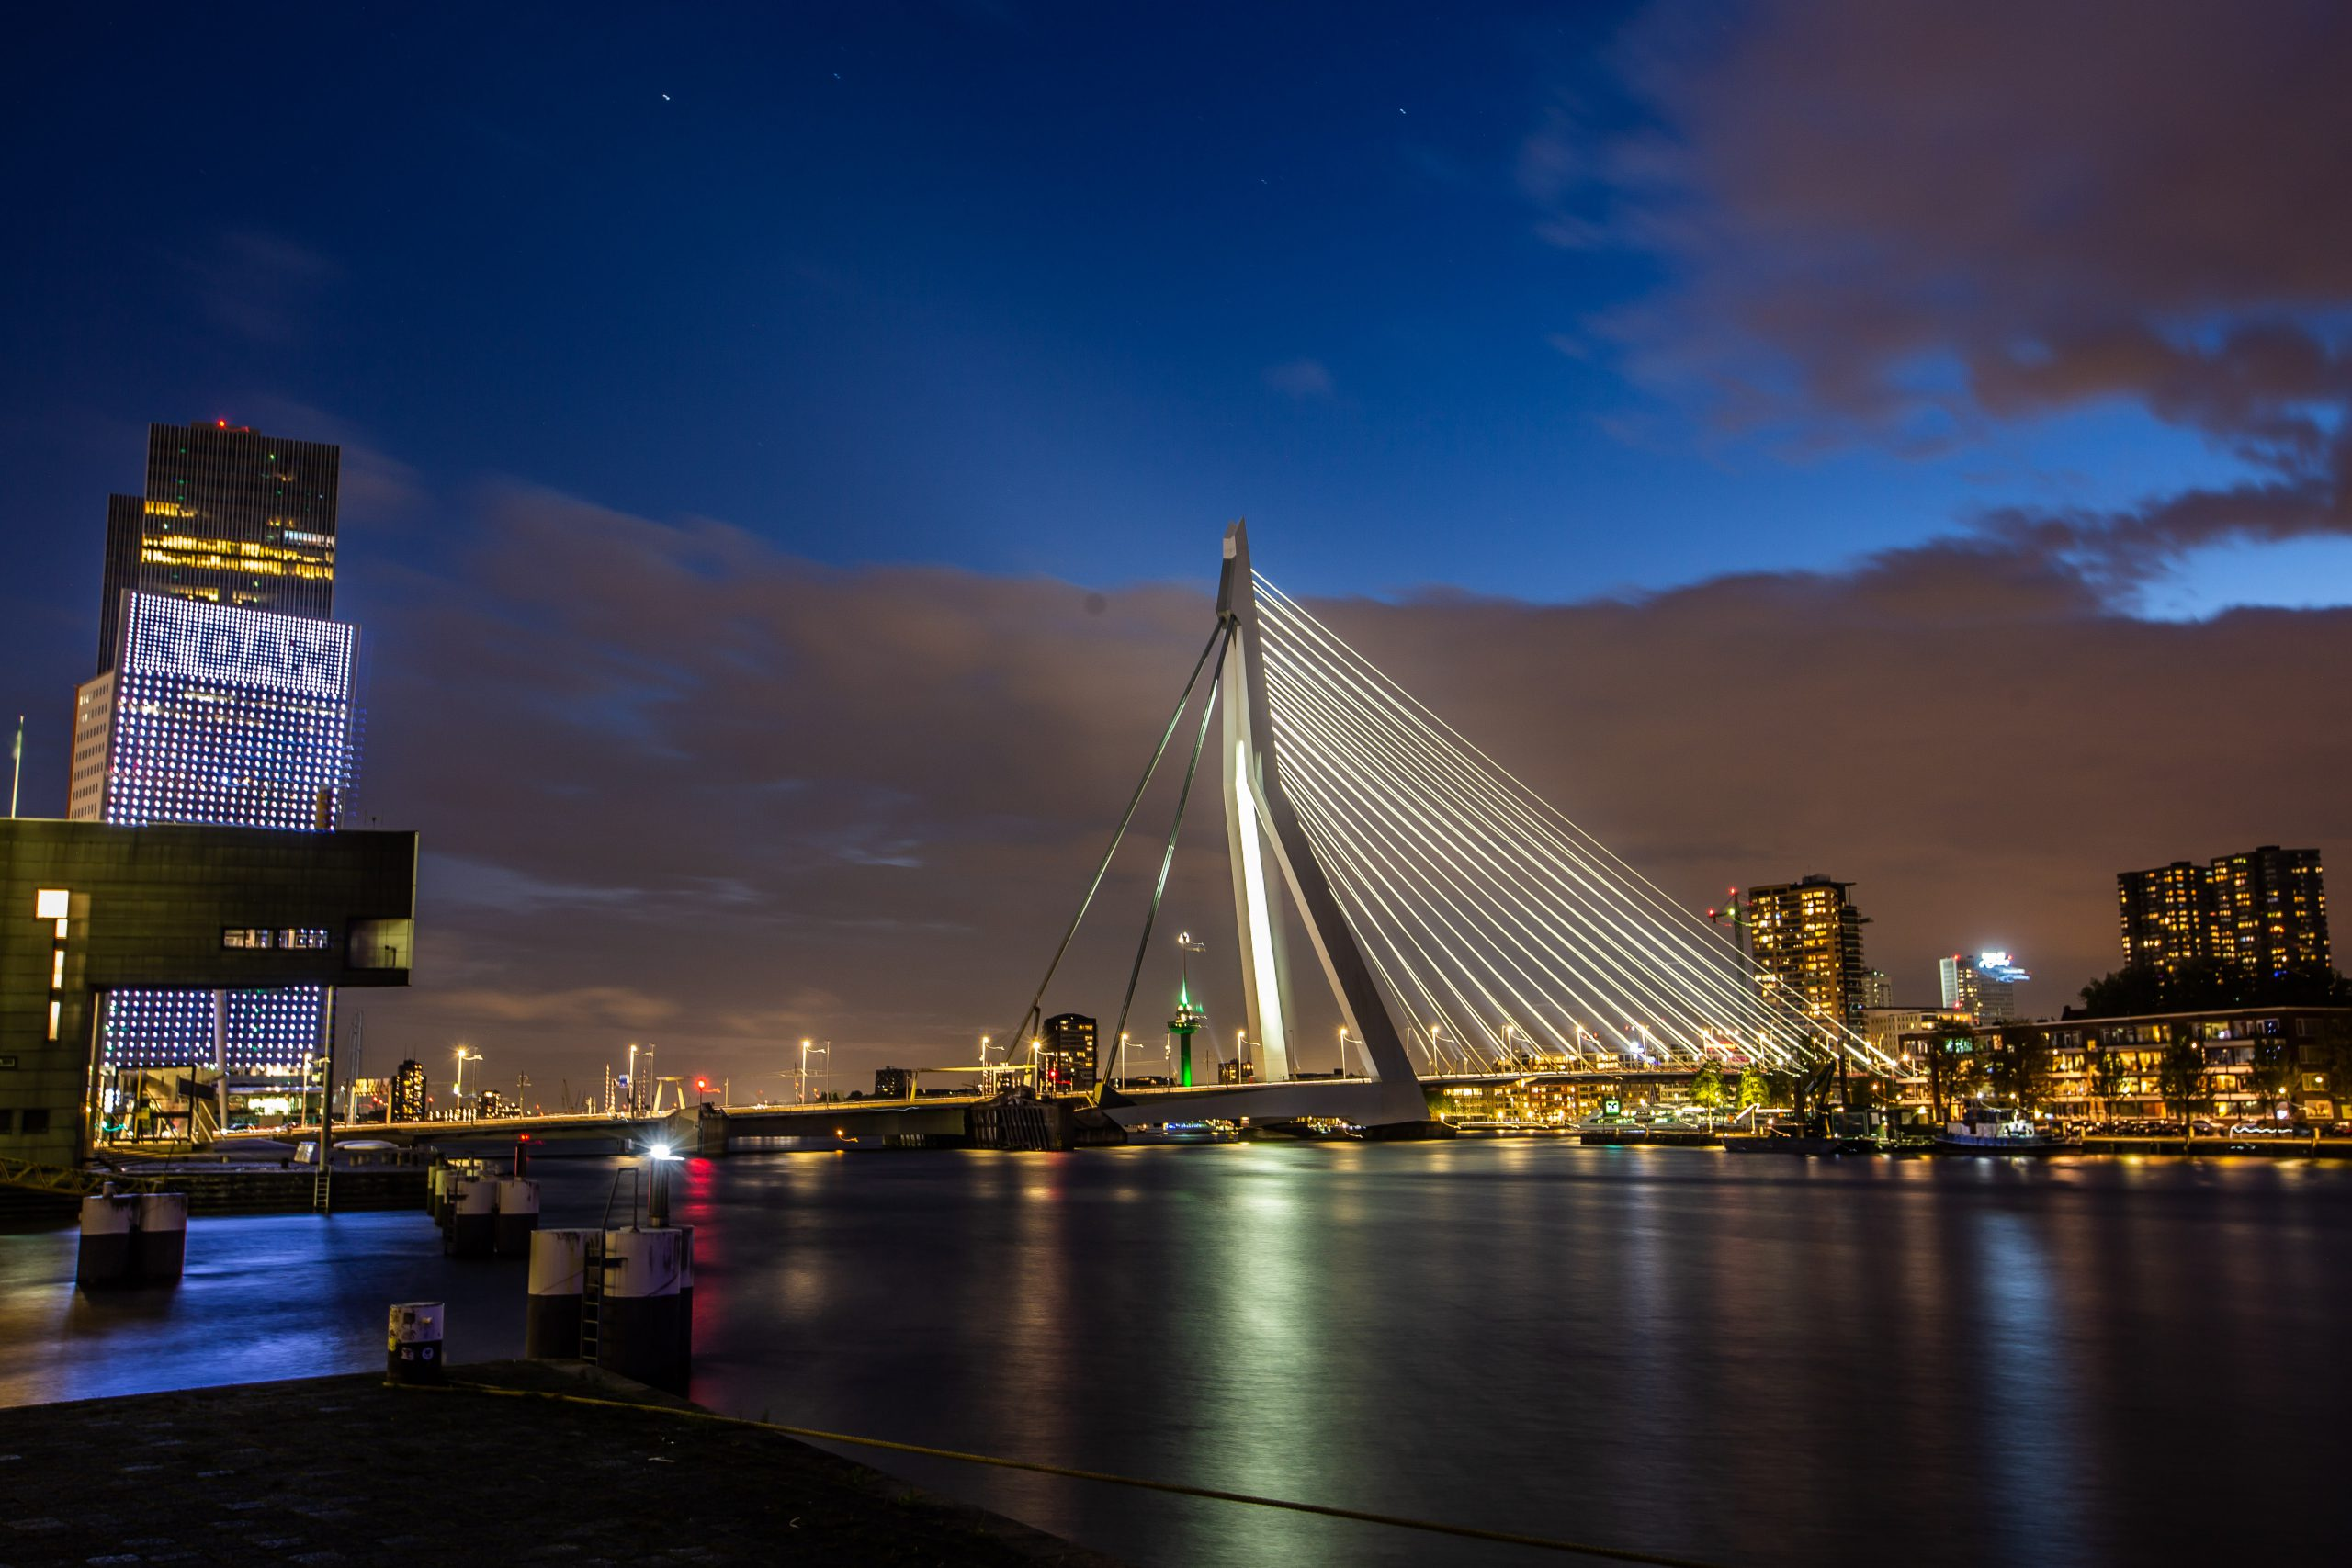 Rotterdam Fotografie Film Webdesign Design Marketing Westland Sgravenzande Maasdijk